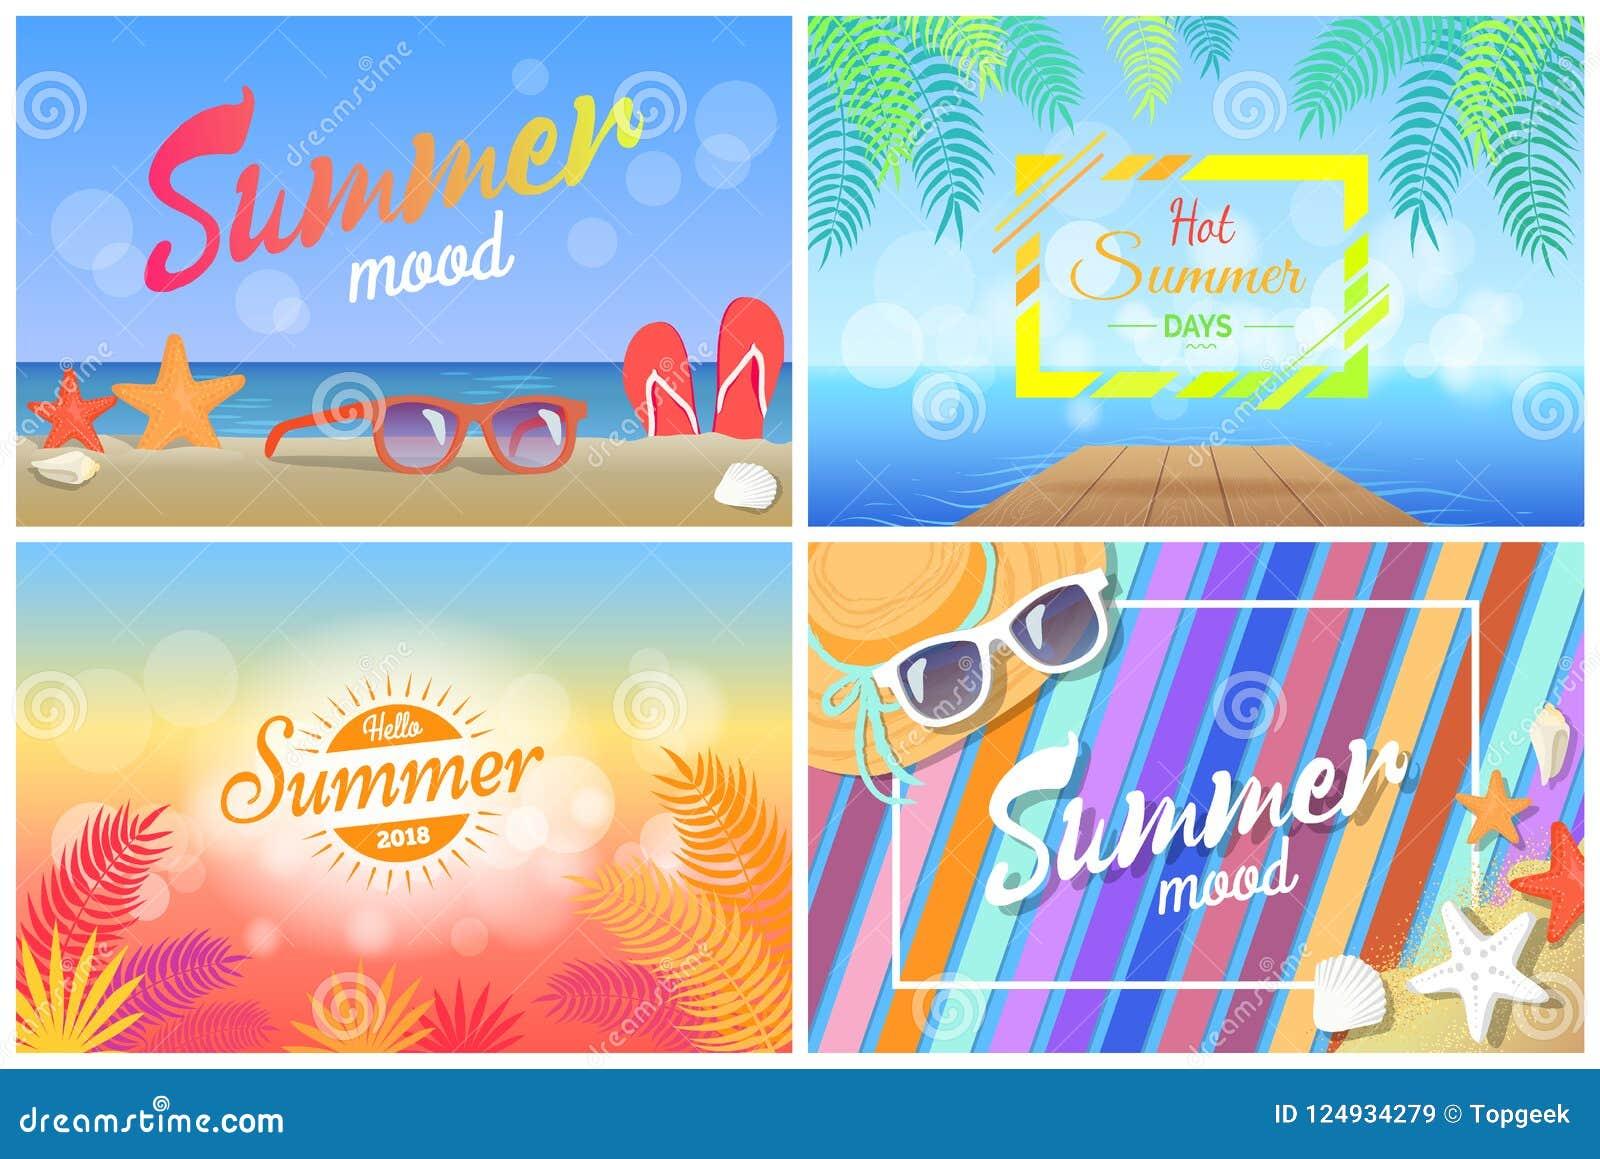 bdcba58d7716 Summer mood hot days hello summertime 2018 posters set sunglasses on beach